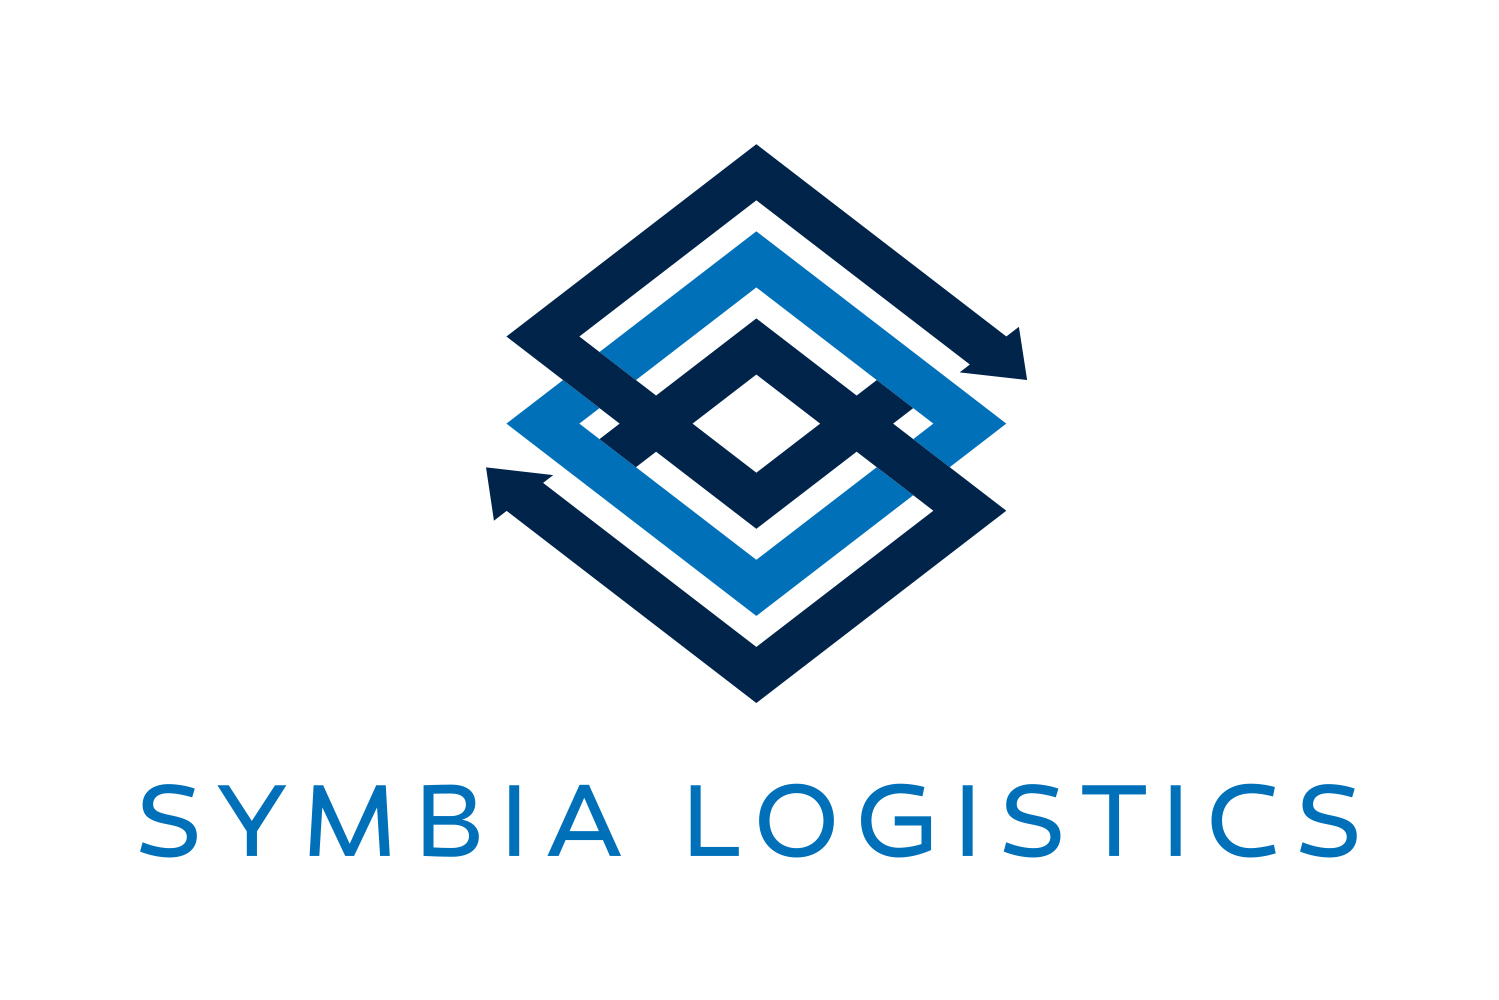 Symbia Logistics